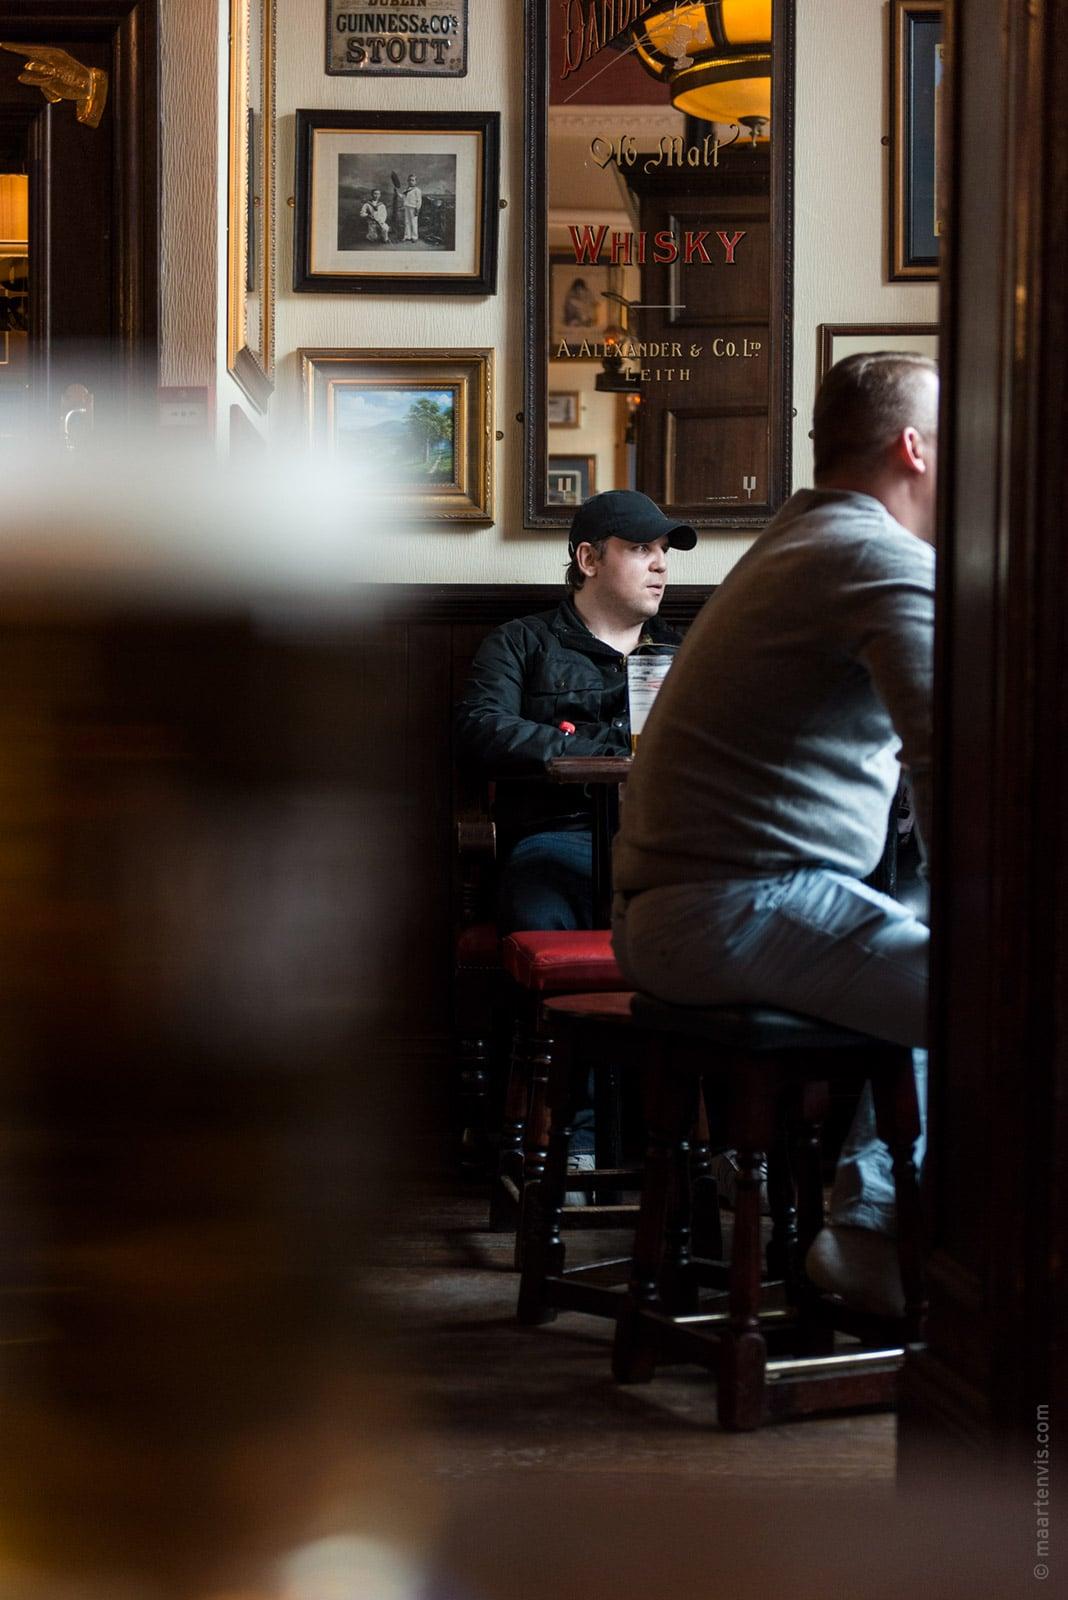 20150523 8758 - Enjoying Edinburgh